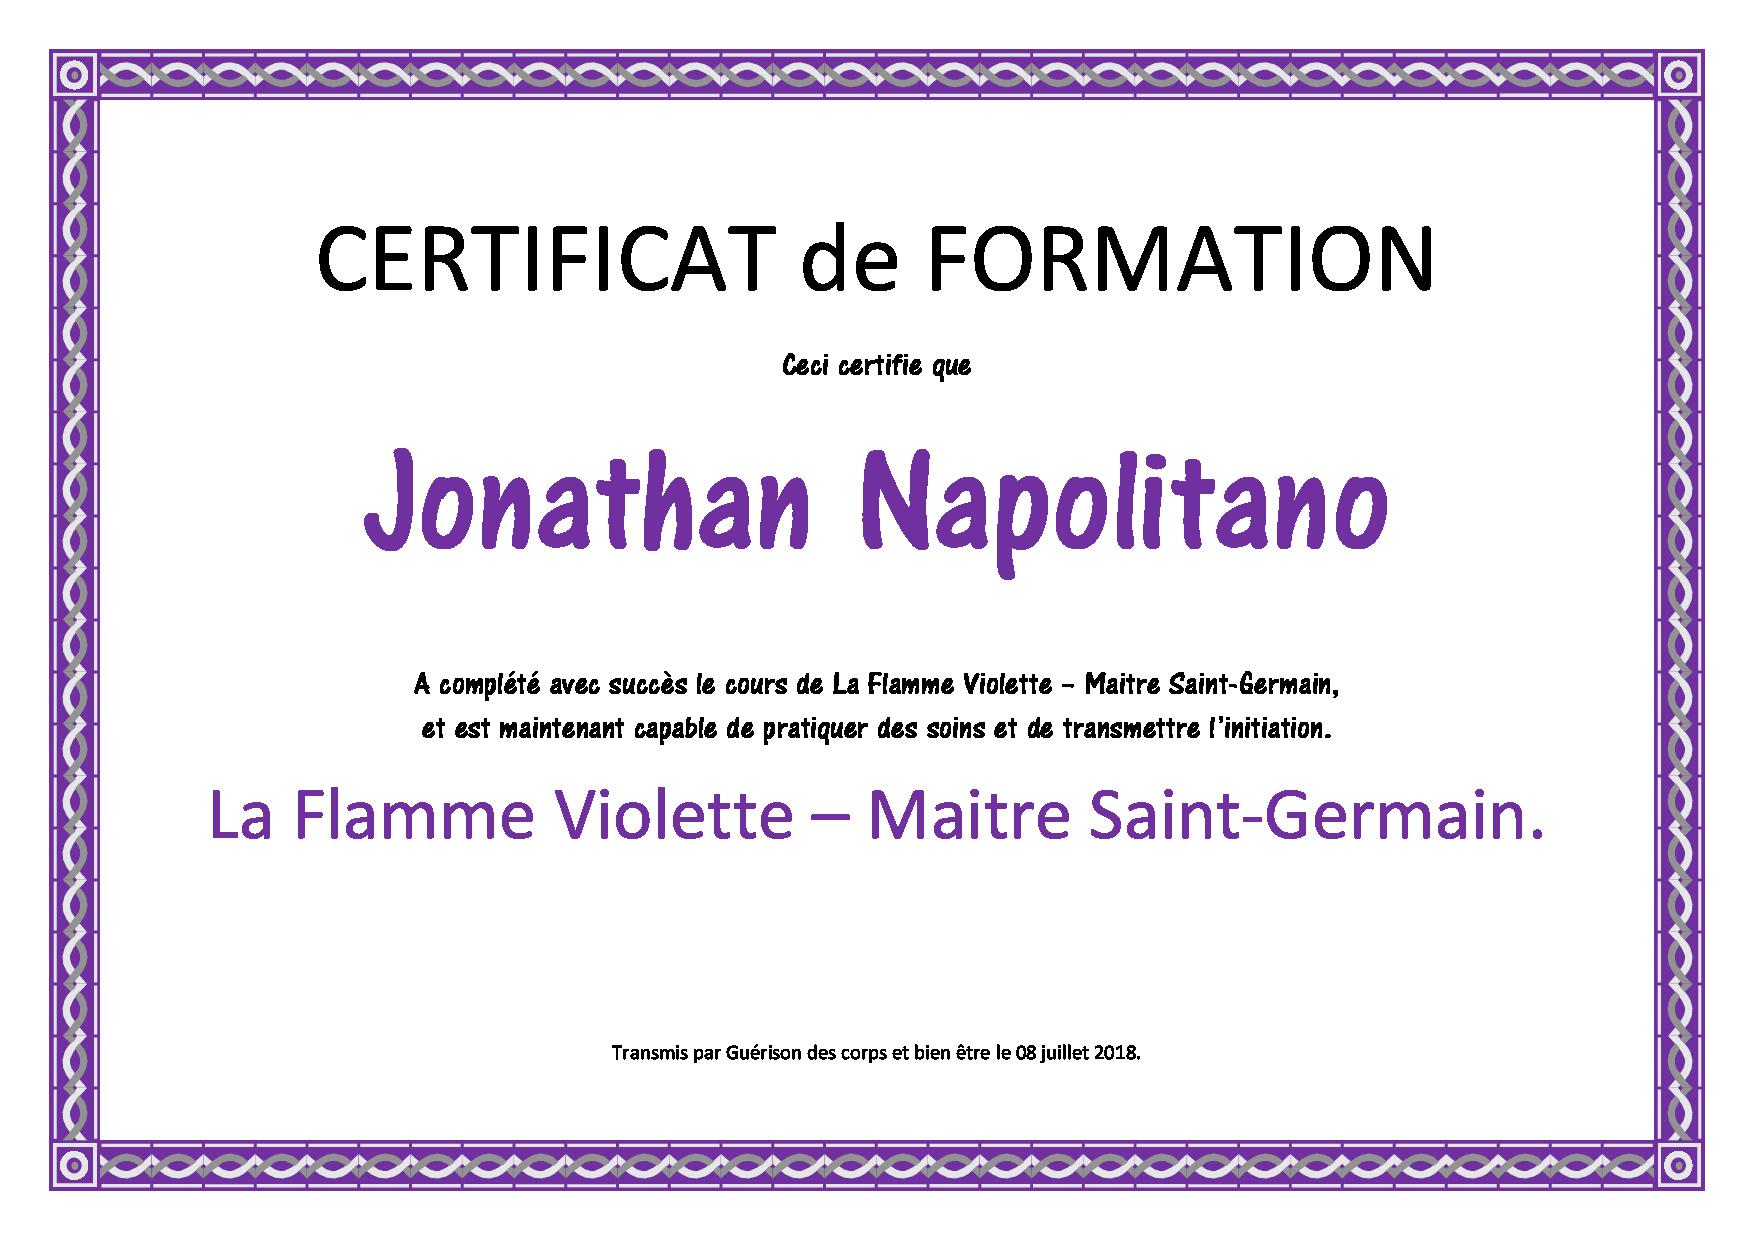 flamme violette – st germain